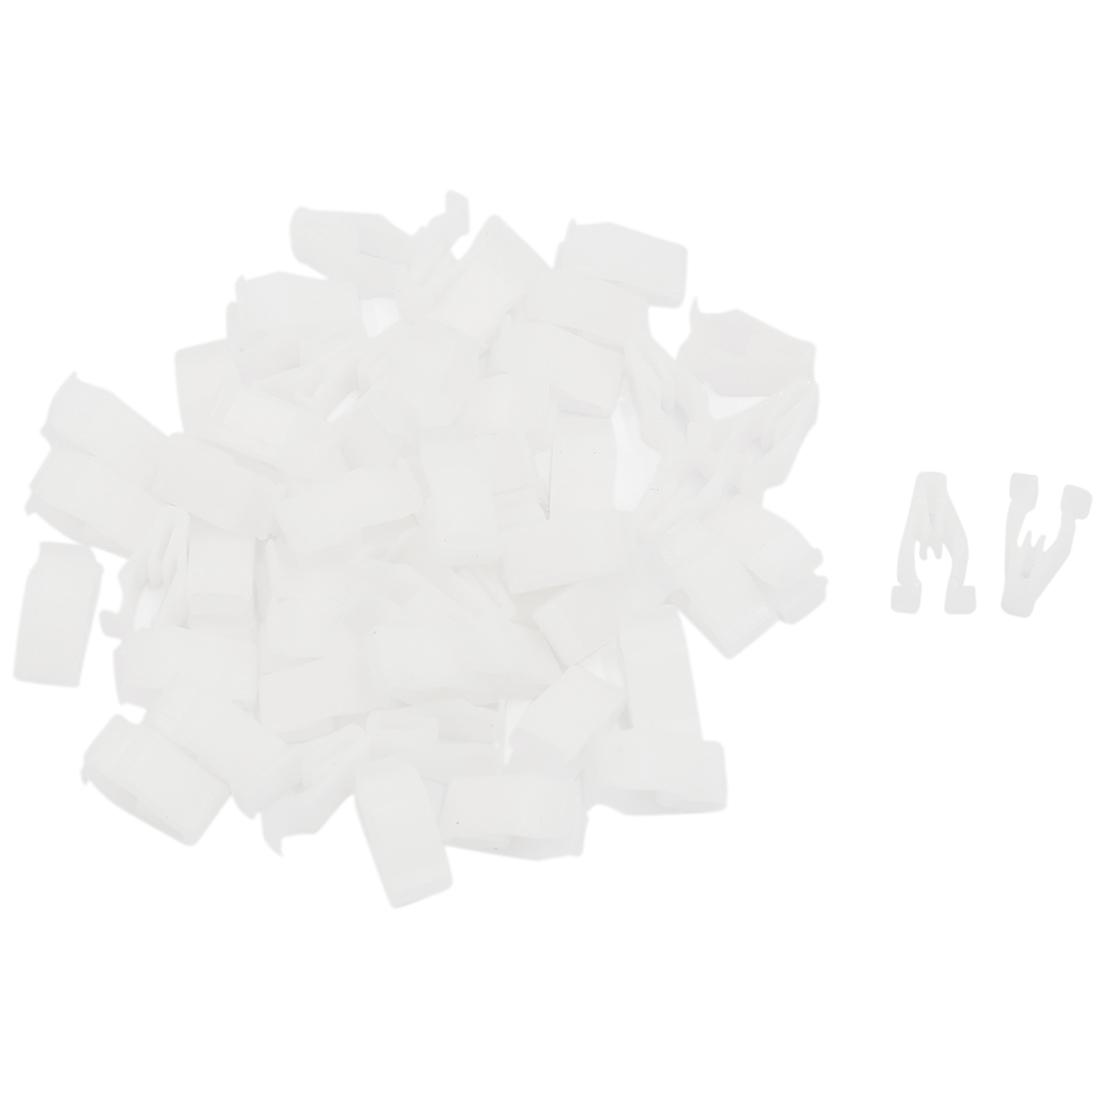 50 Pcs White Plastic Car Instrument Panel Dashboard Rivet Retainer Clip 6mm Hole